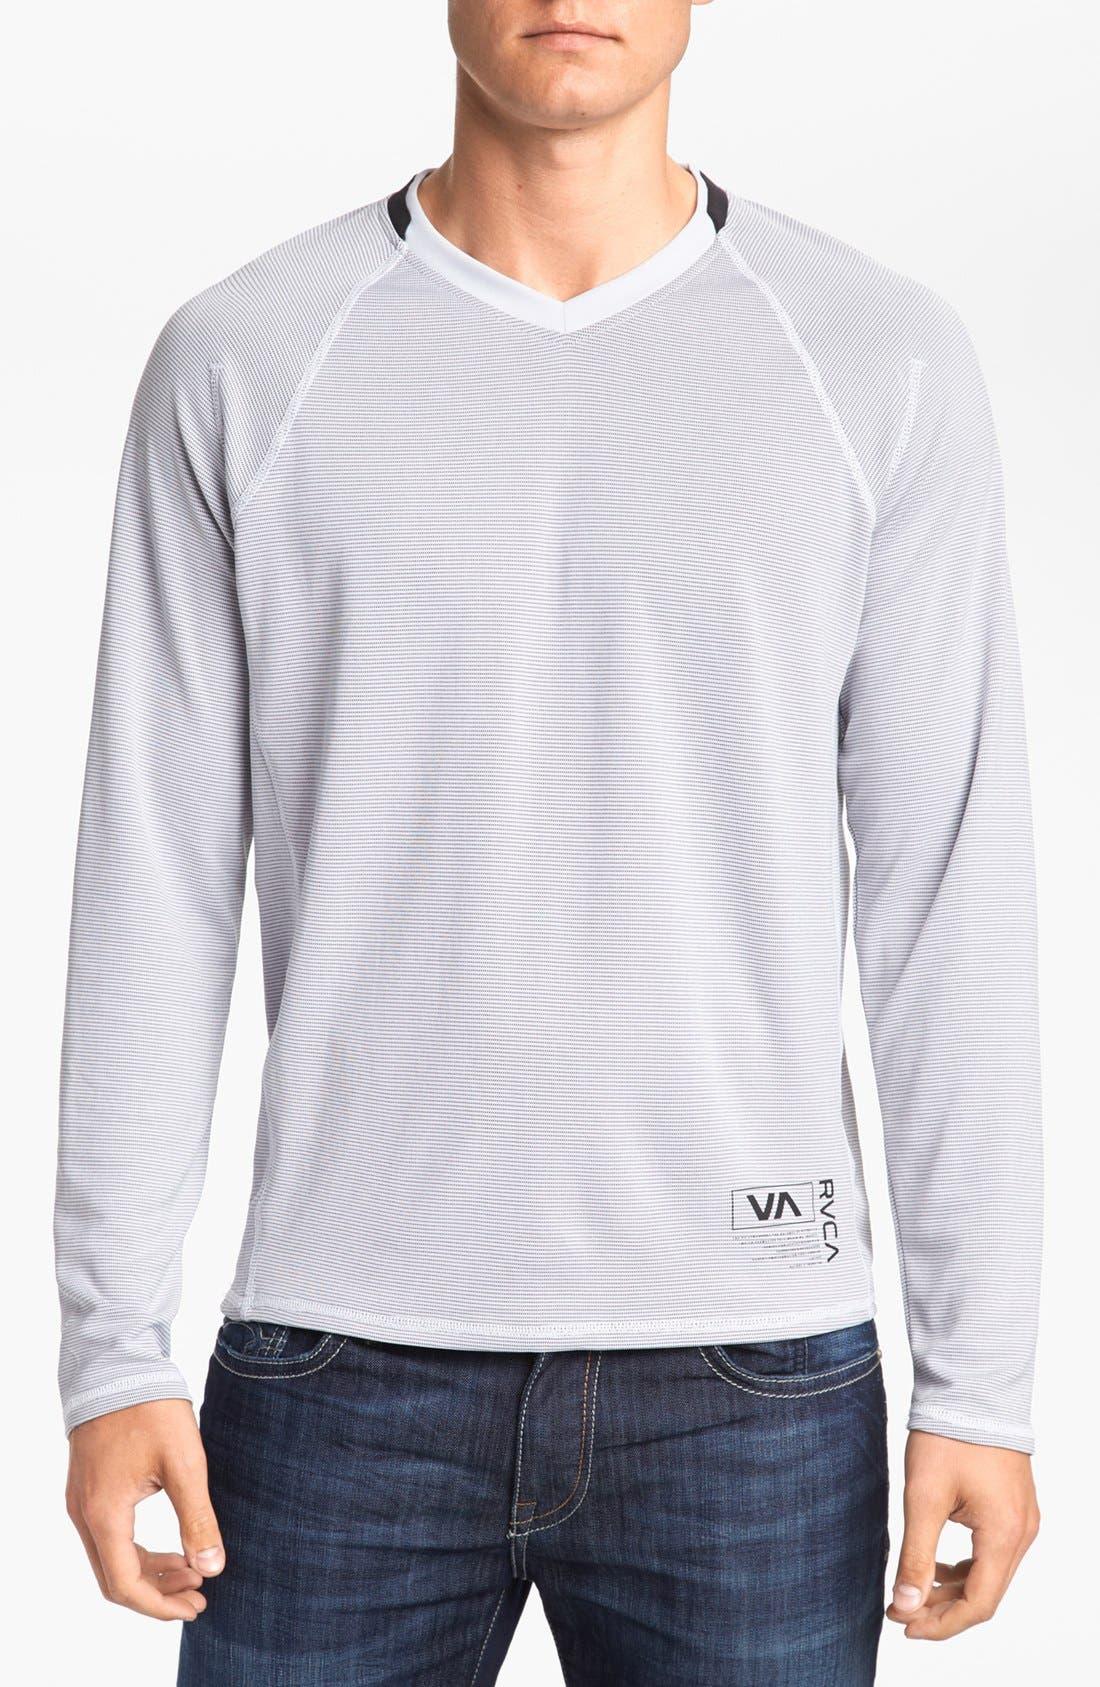 Alternate Image 1 Selected - RVCA 'Fraction' Long Sleeve V-Neck T-Shirt